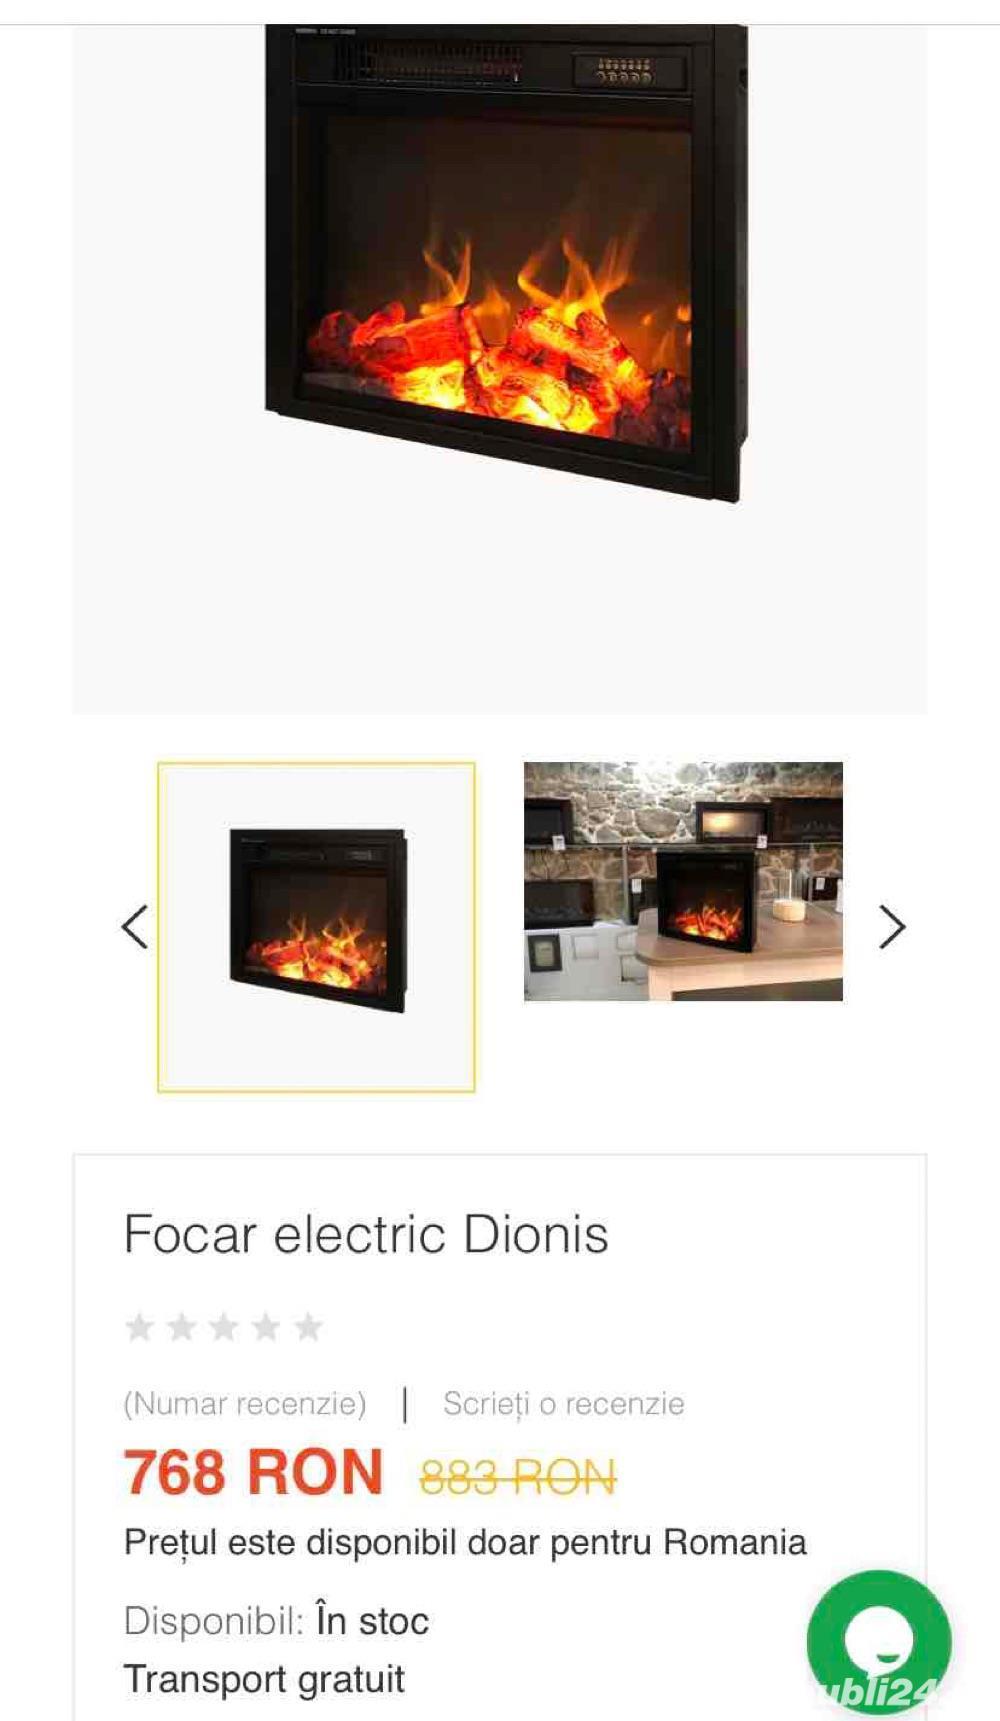 Focar electric Dionis